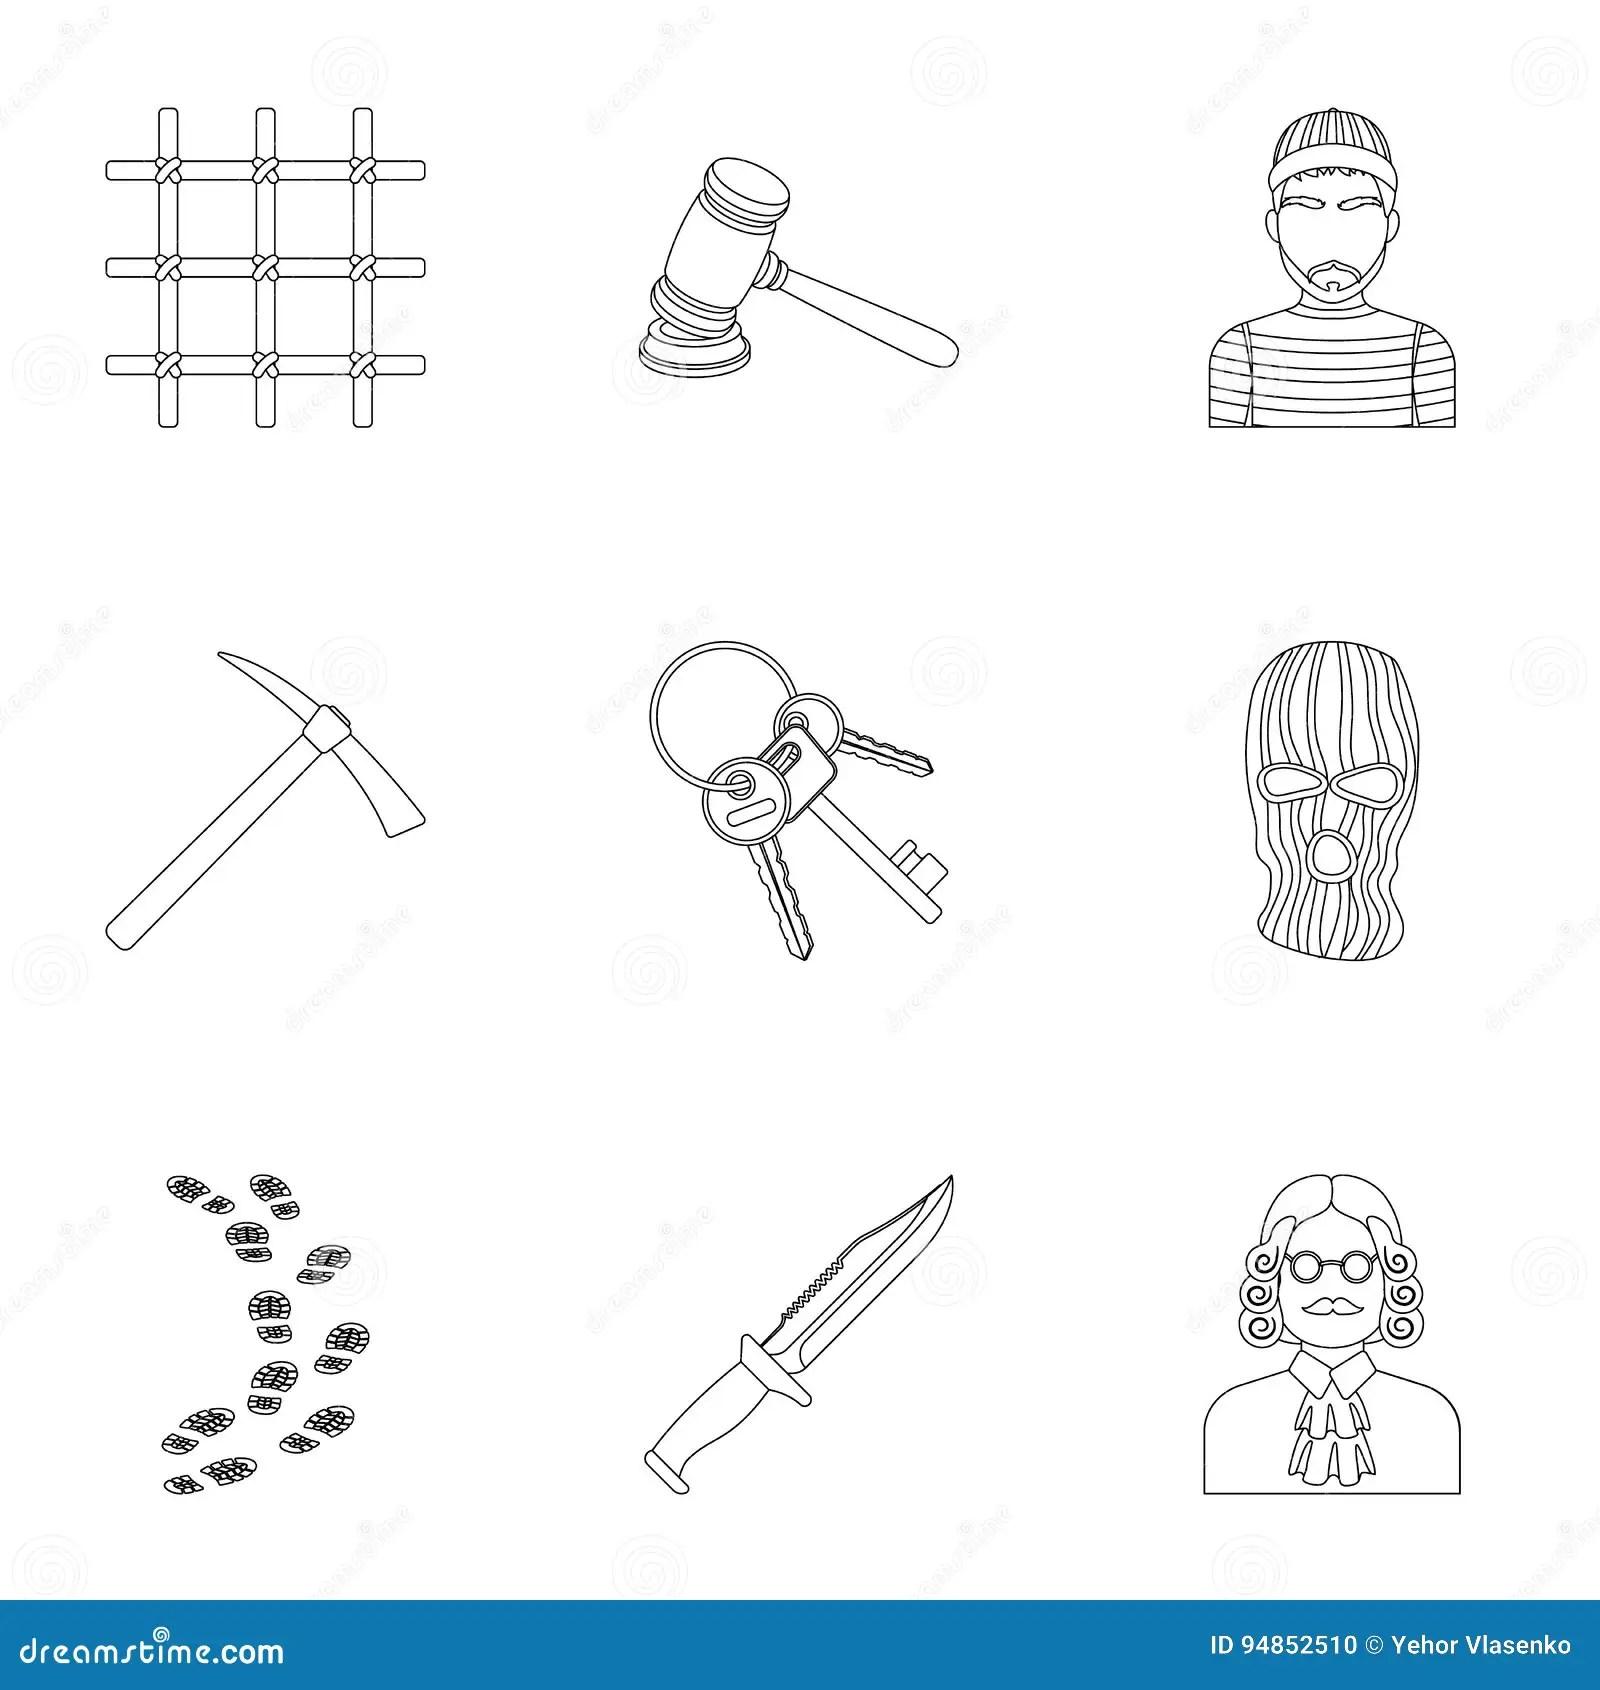 Punishment Cartoons, Illustrations & Vector Stock Images